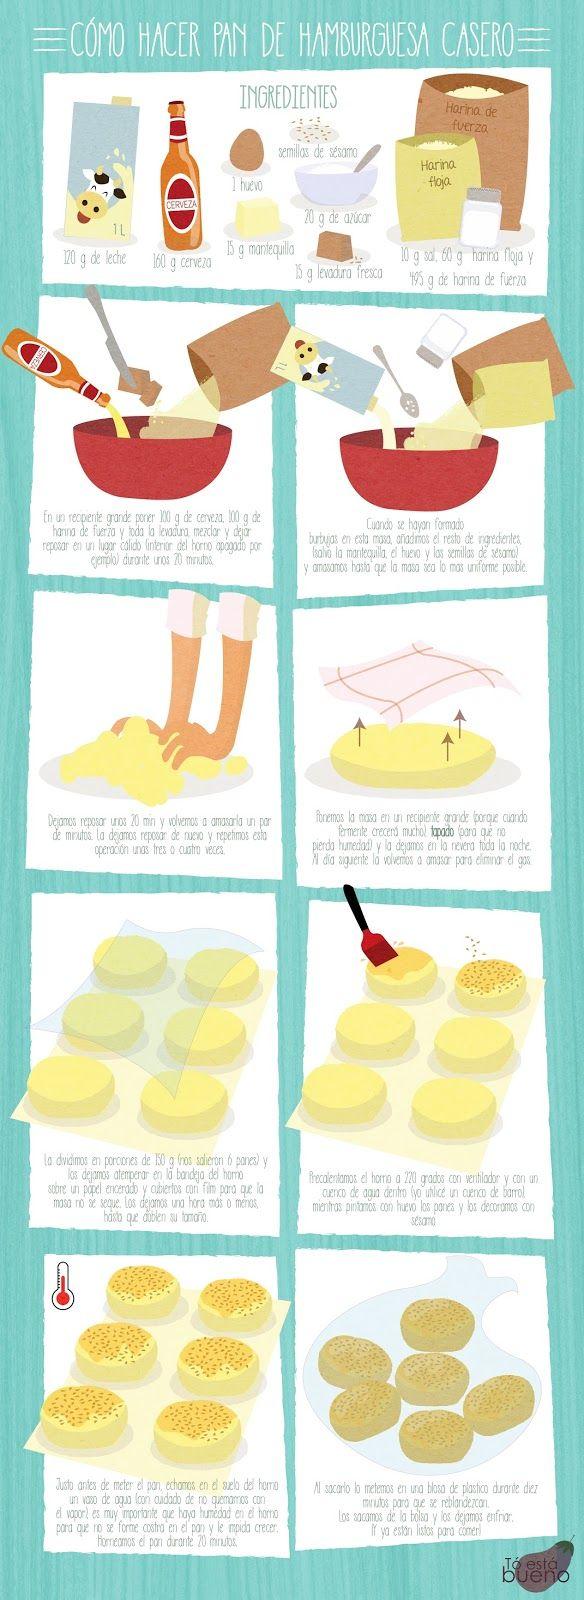 Cómo hacer pan de hamburguesa casero  http://toestabueno.blogspot.com.es/2014/09/post-especial-pan-de-hamburguesa-casero.html